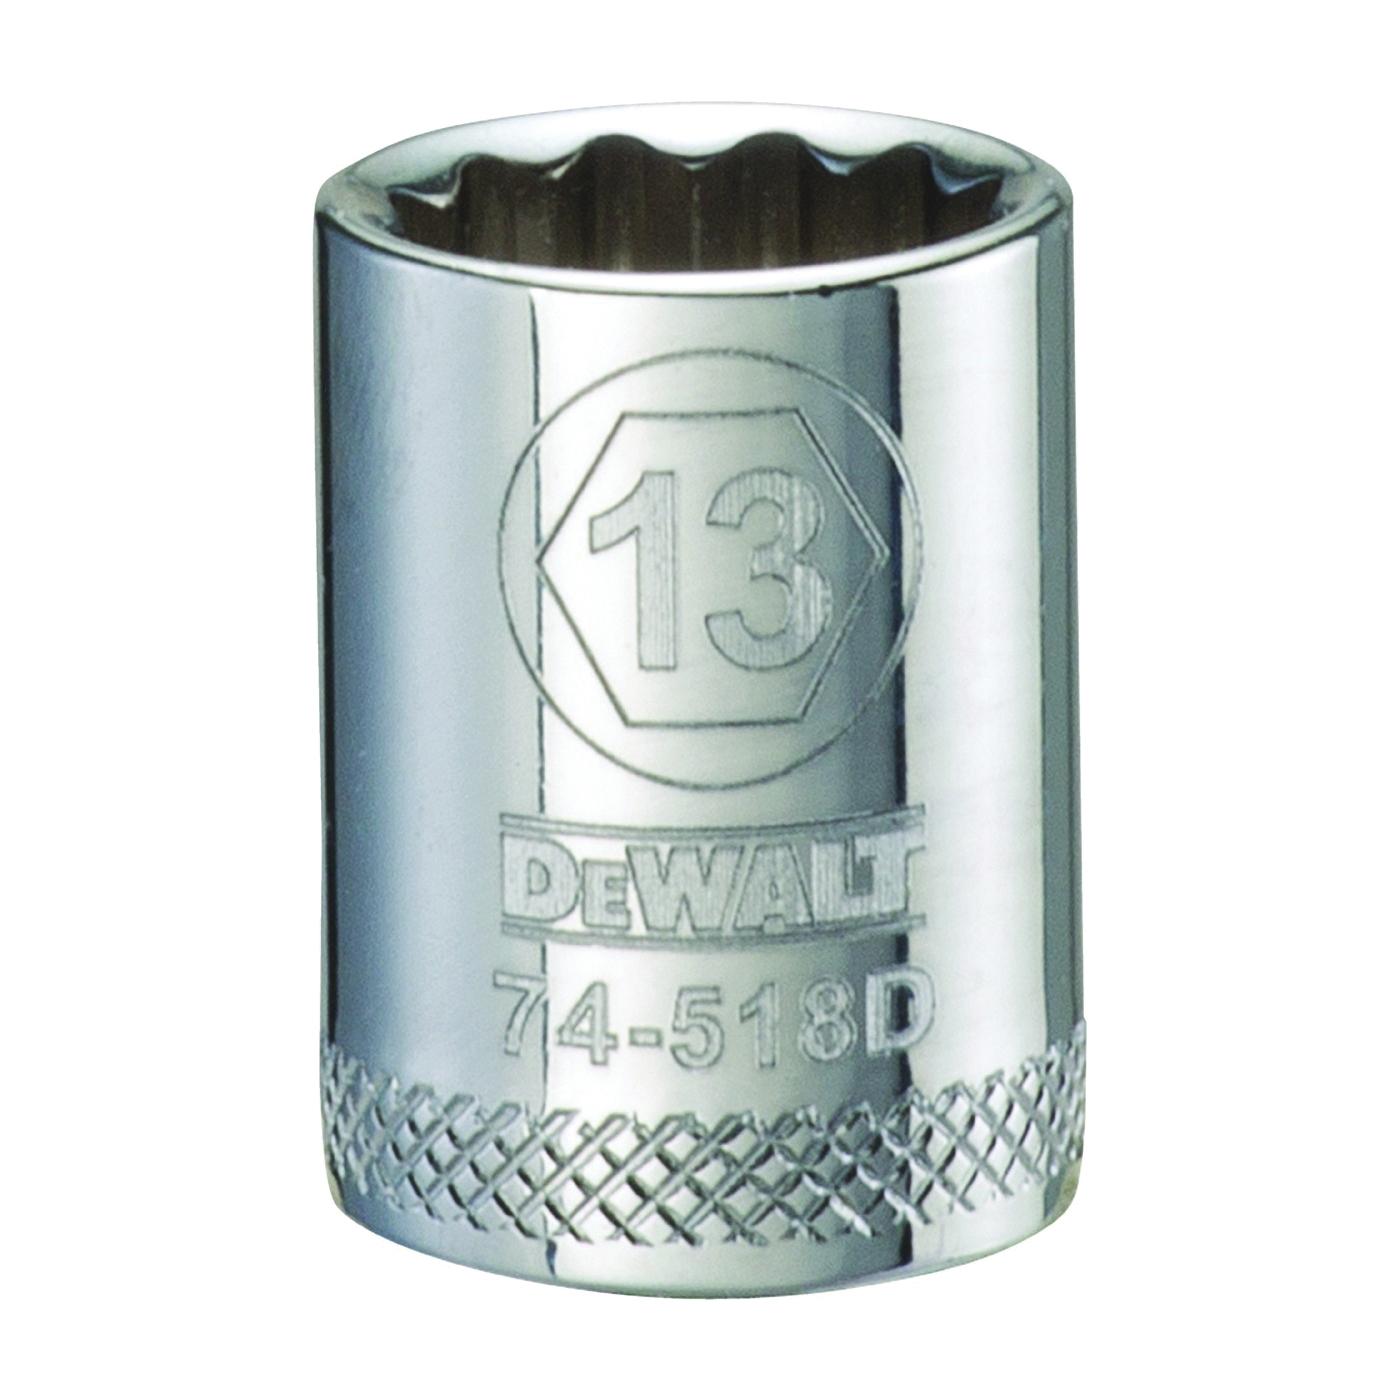 Picture of DeWALT DWMT74518OSP Hand Socket, 13 mm Socket, 3/8 in Drive, 12 -Point, Vanadium Steel, Polished Chrome